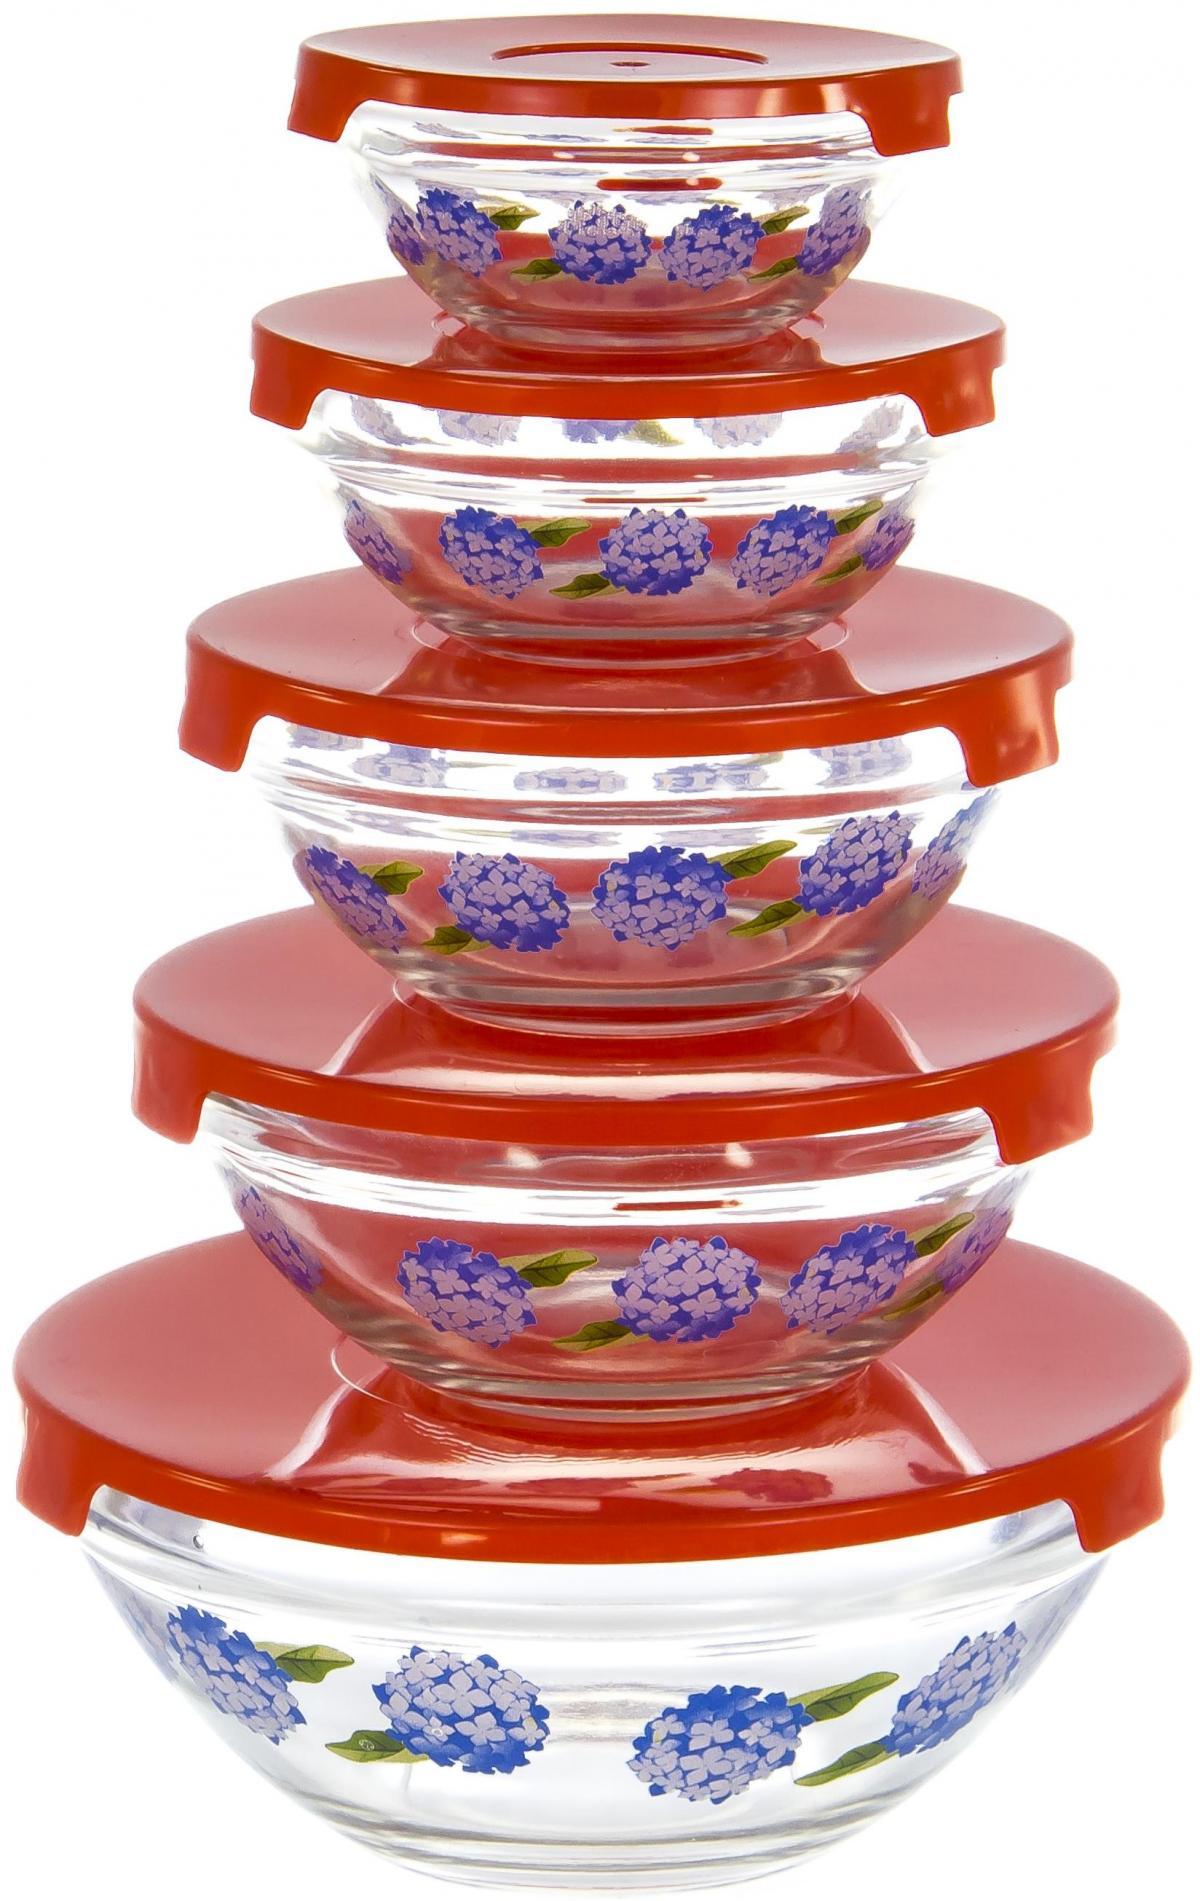 Набор салатников Olaff, с крышкой, 5 предметов. AX-5SB-R-02AX-5SB-R-02набор 5 салатников d-100мм, 103мм, 125мм, 140мм, 170мм с пластик.крышками, подарочная упаковка